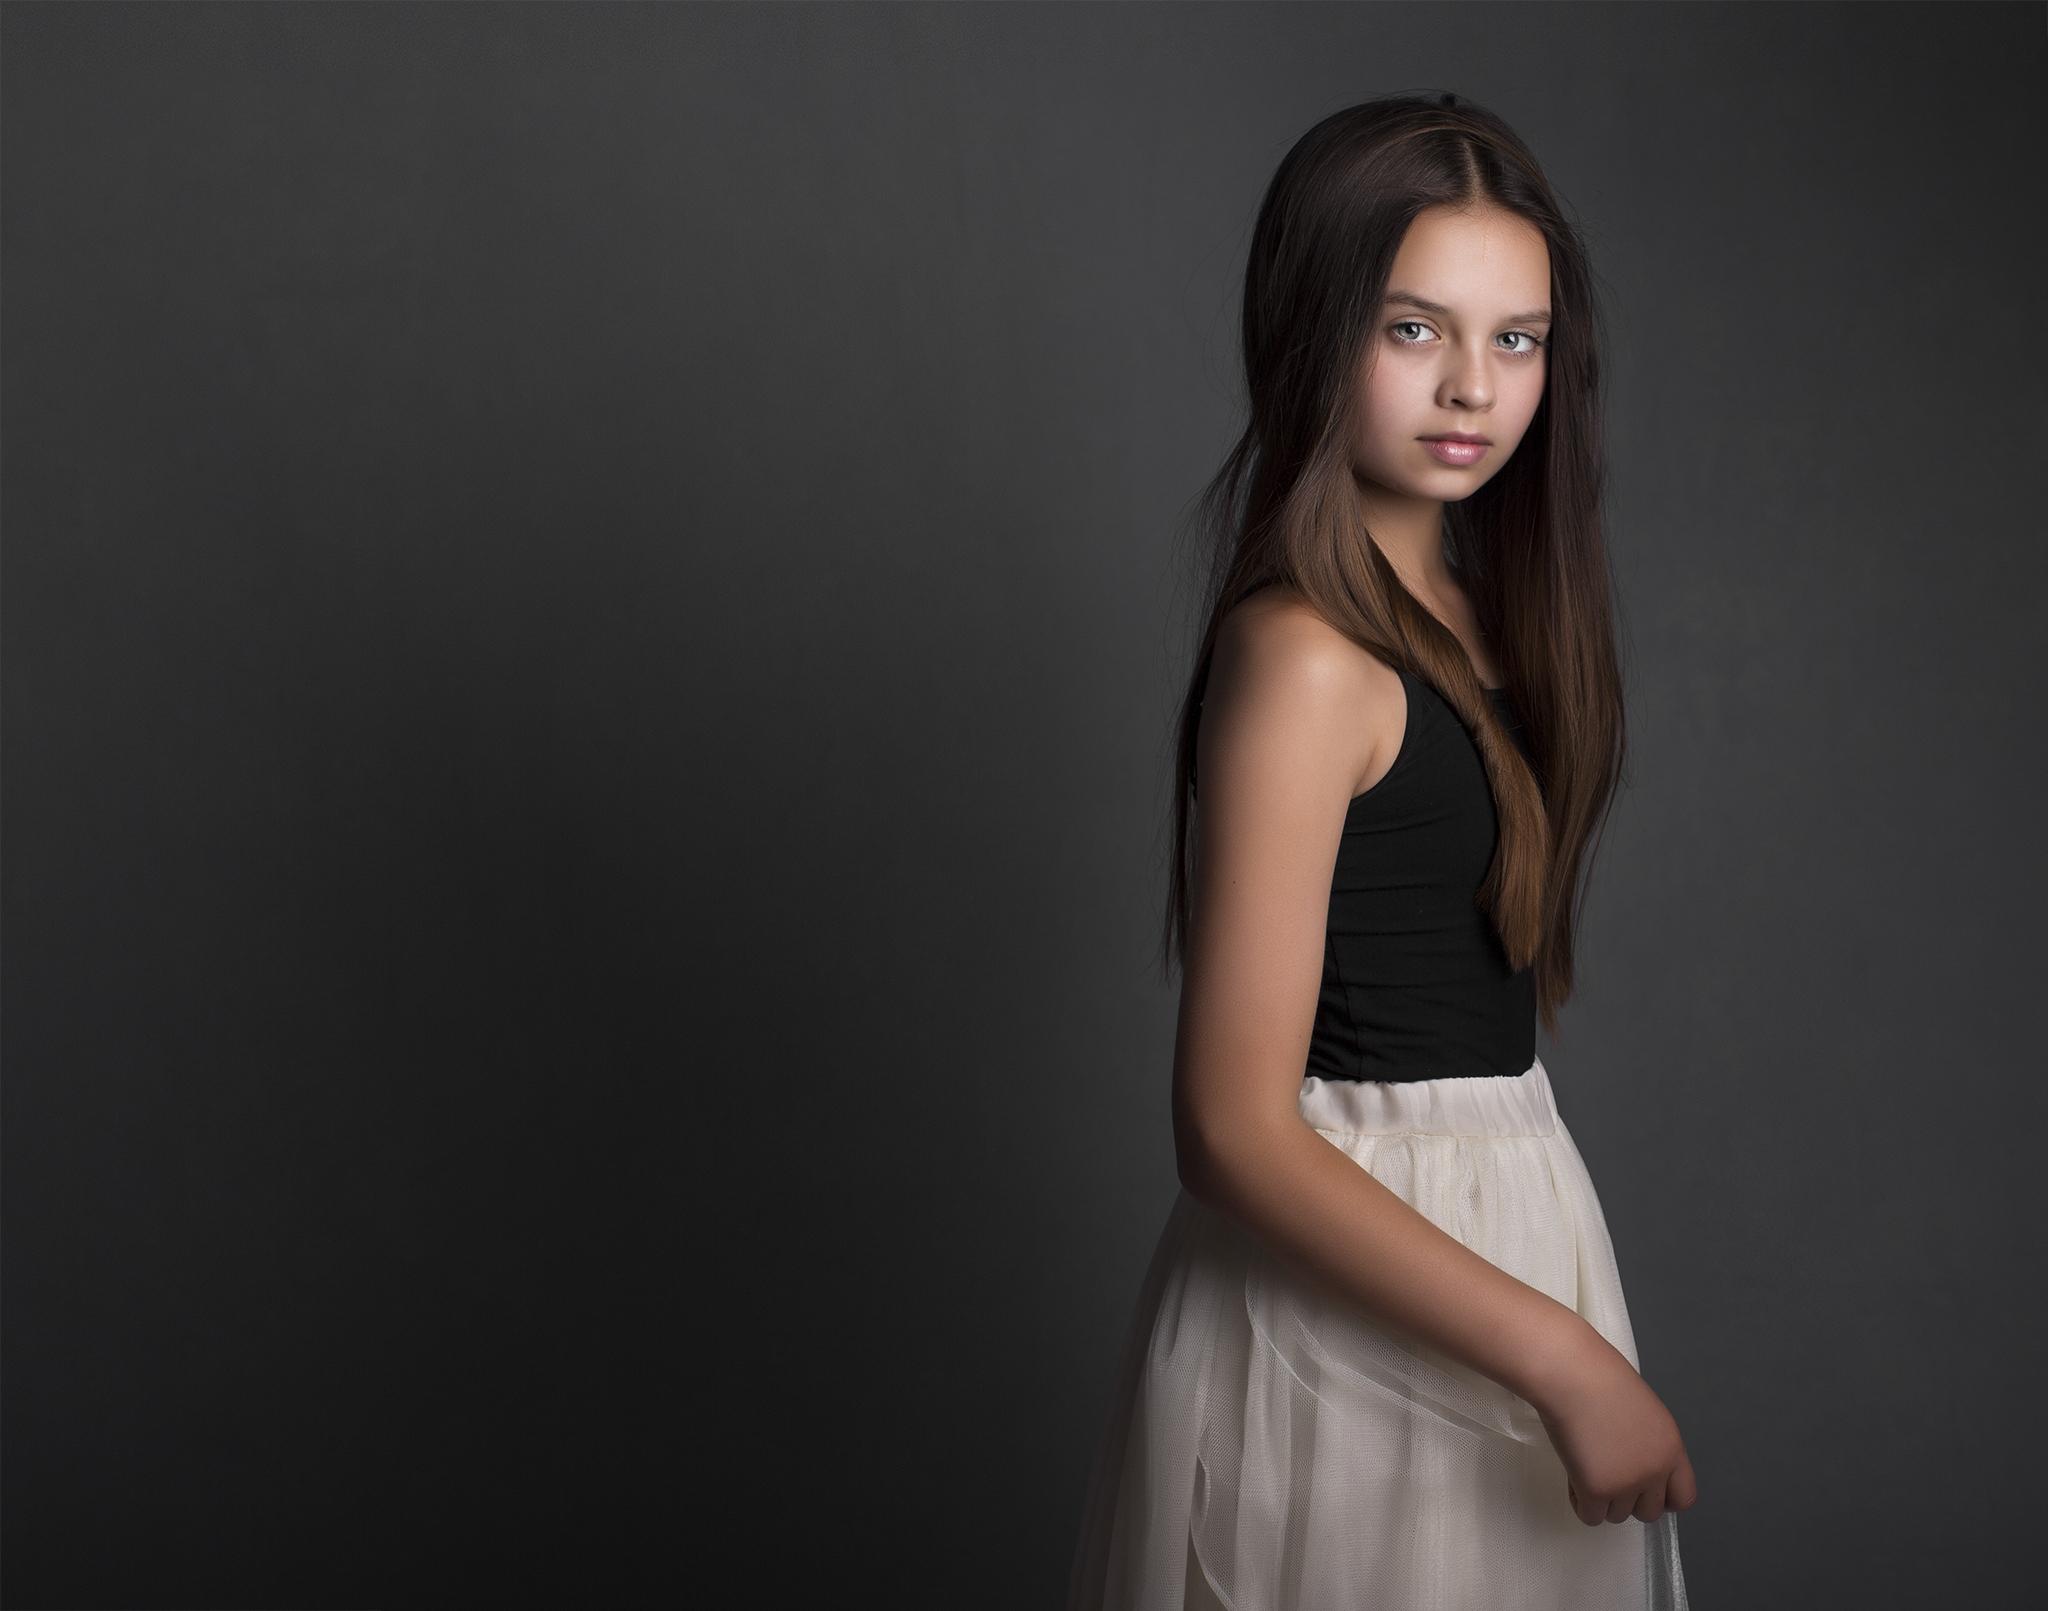 elizabethgphotography_fineart_kingslangley_hertfordshire_child_model_francesca_kids_london_4.jpg